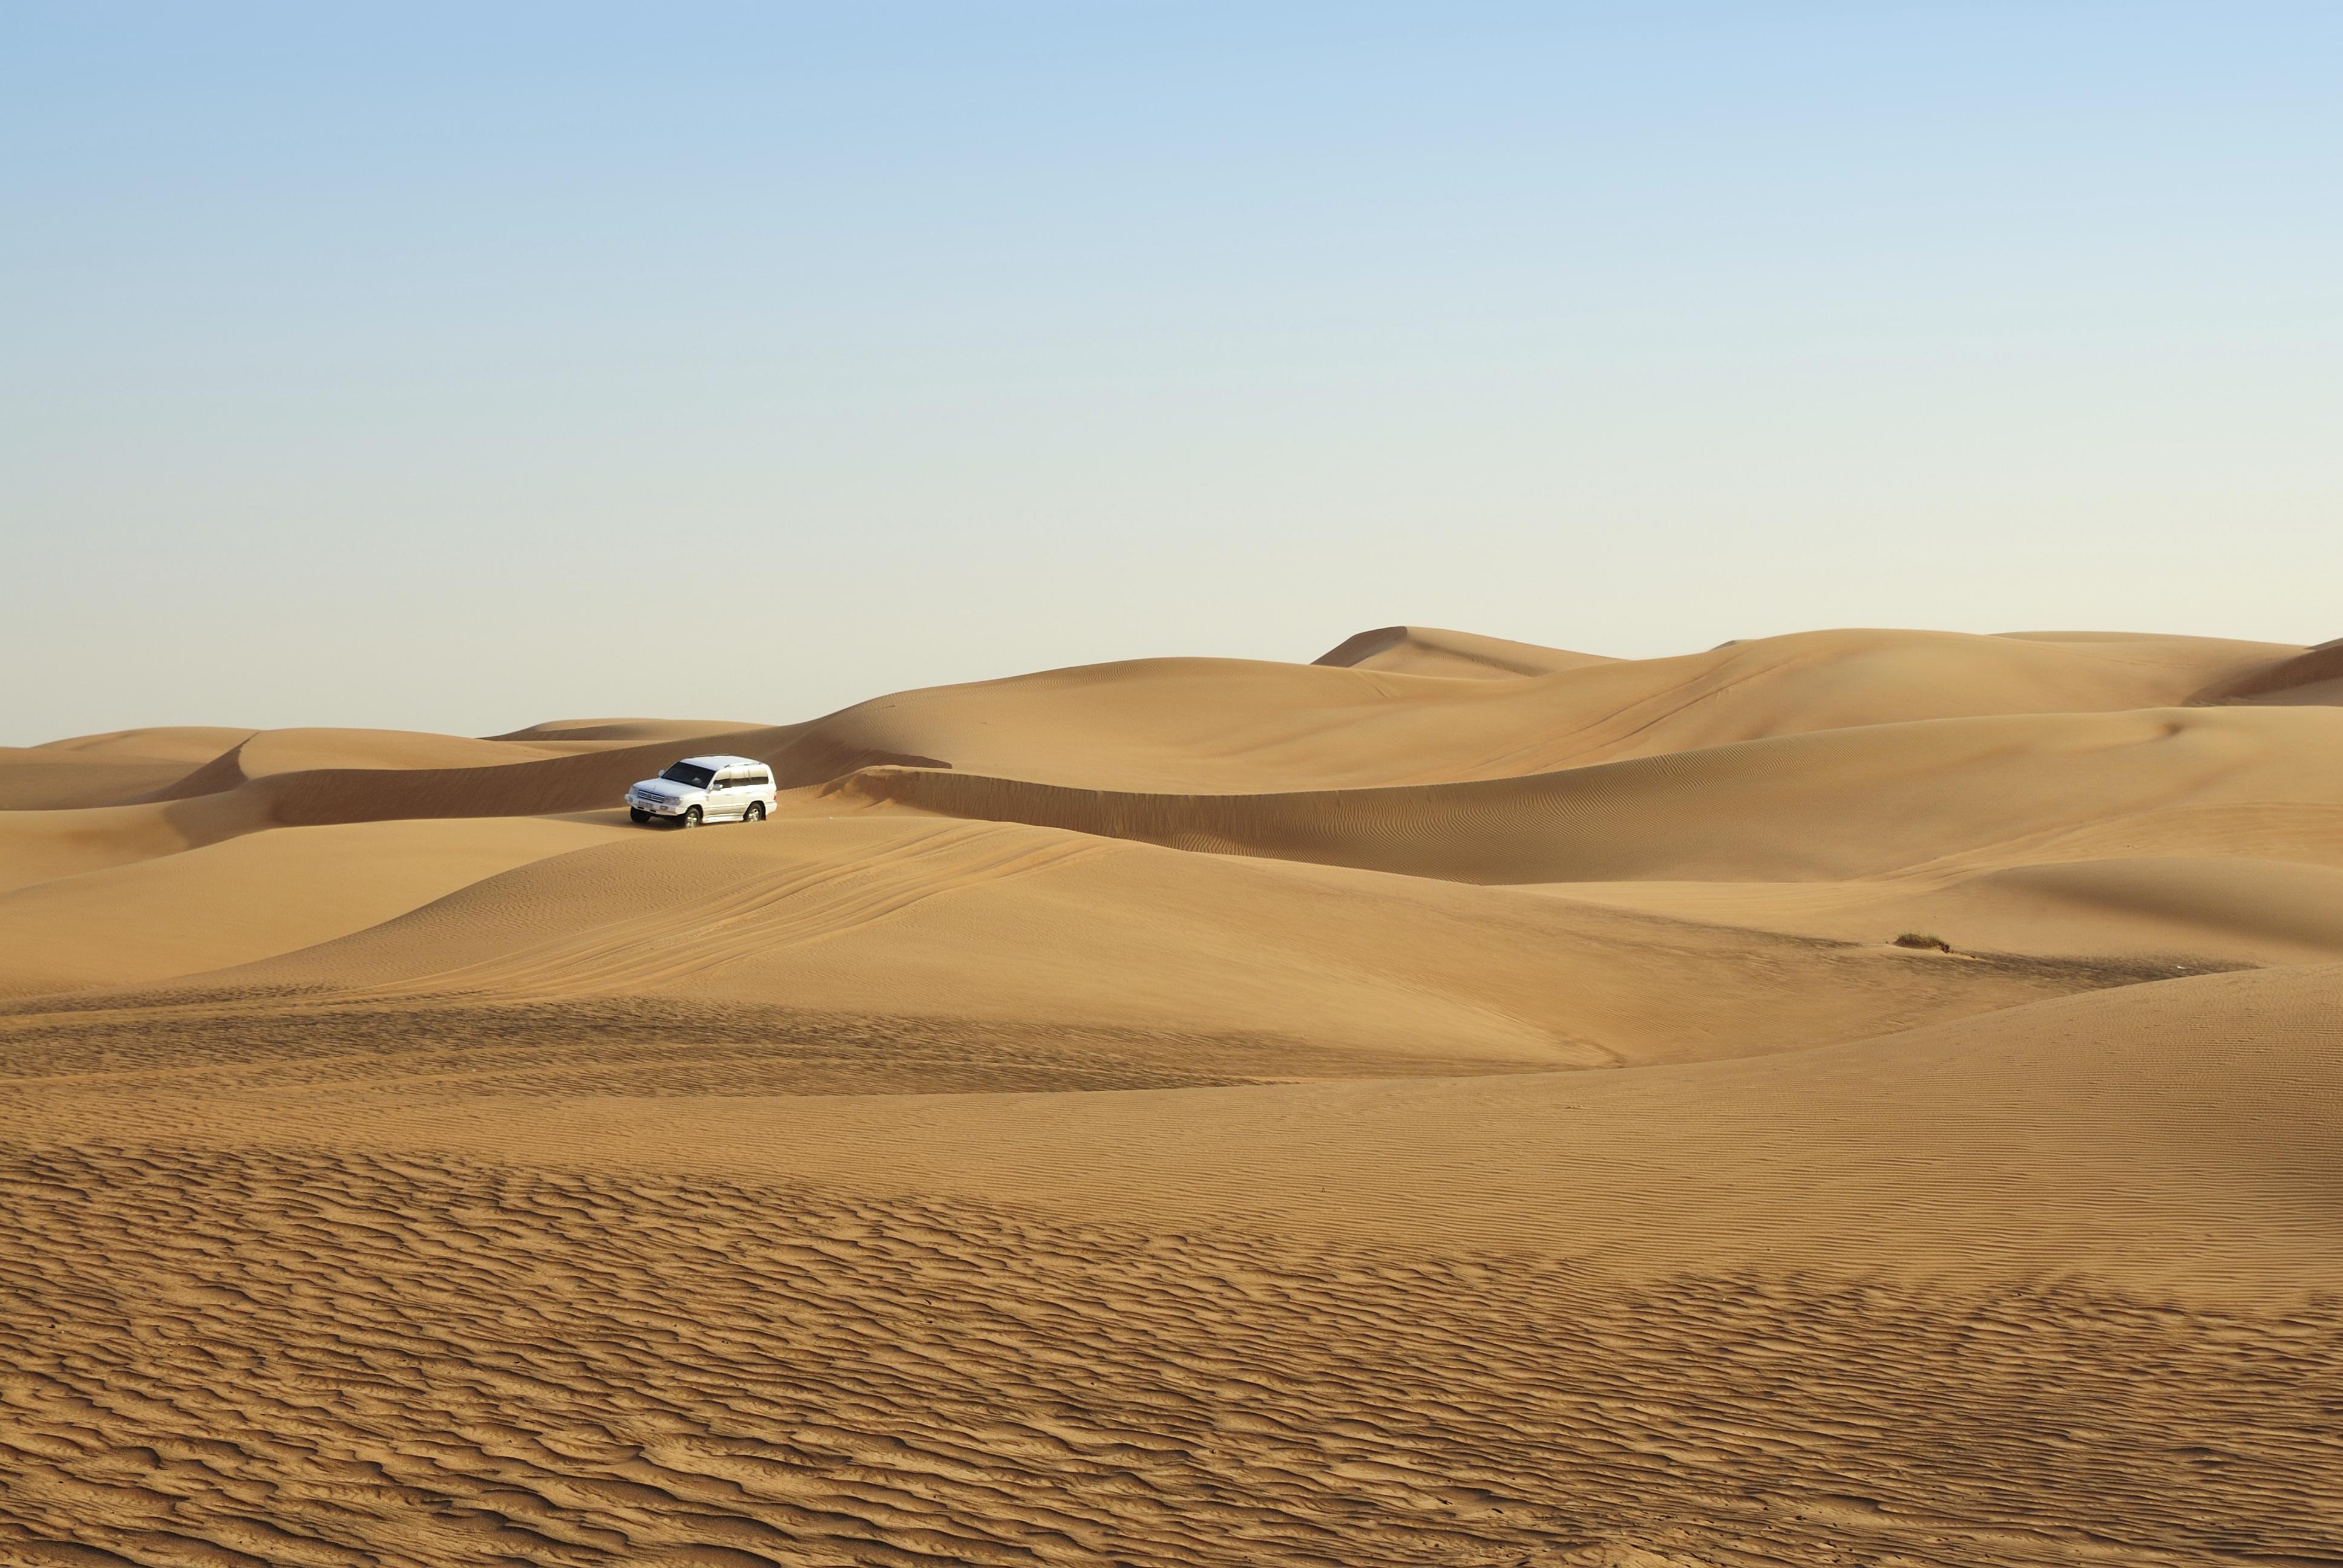 Enjoy a desert safari